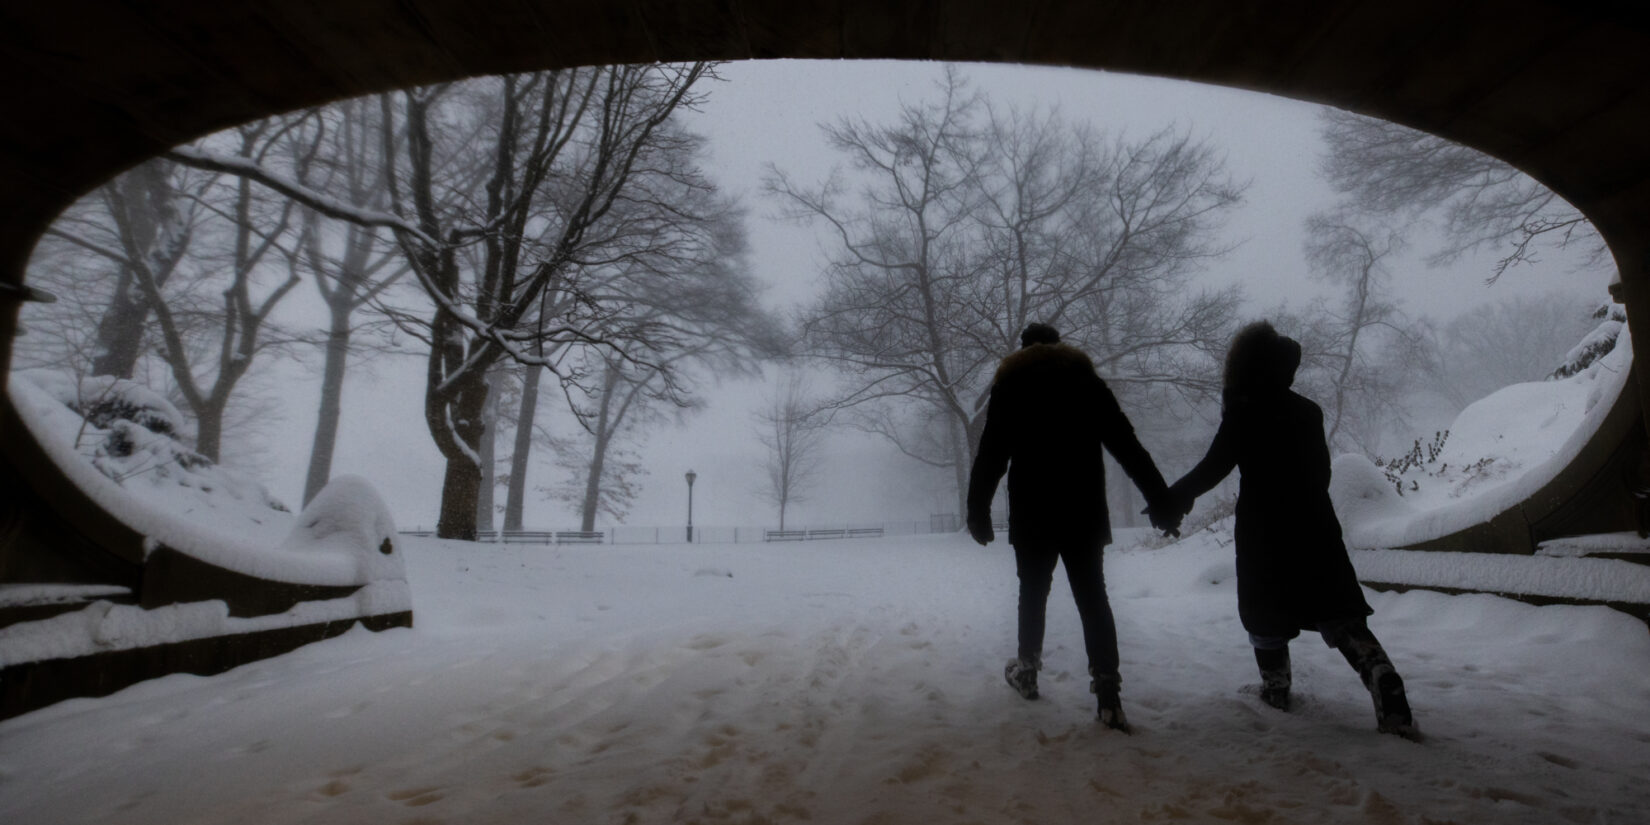 A couple trudge beneath Dalehead Arch in a snowstorm